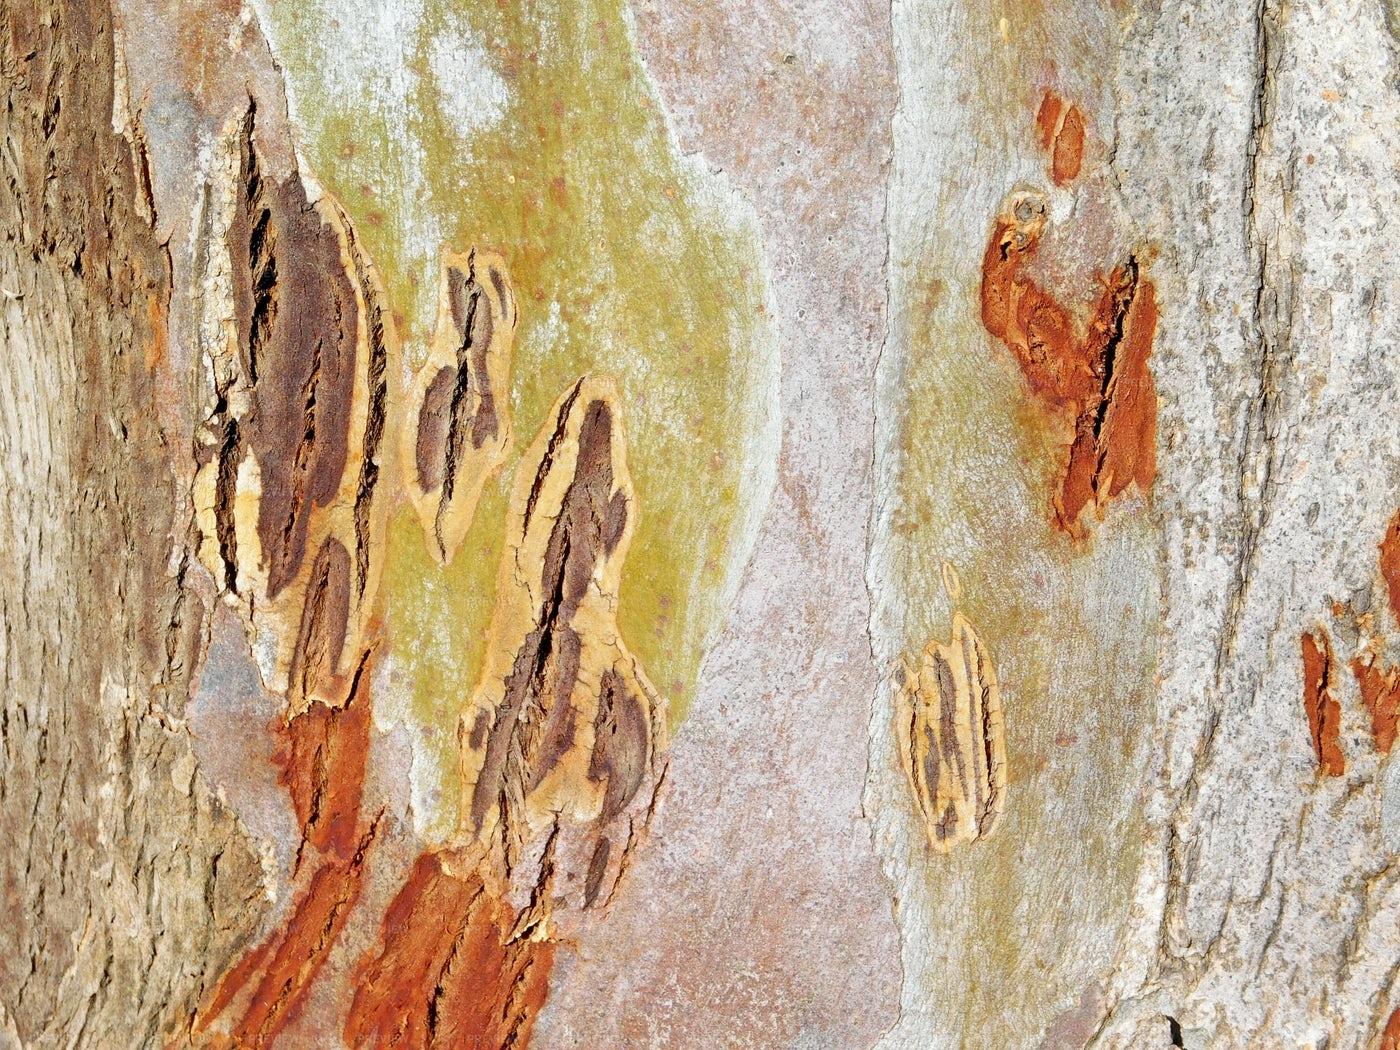 Tree Trunk Textures: Stock Photos